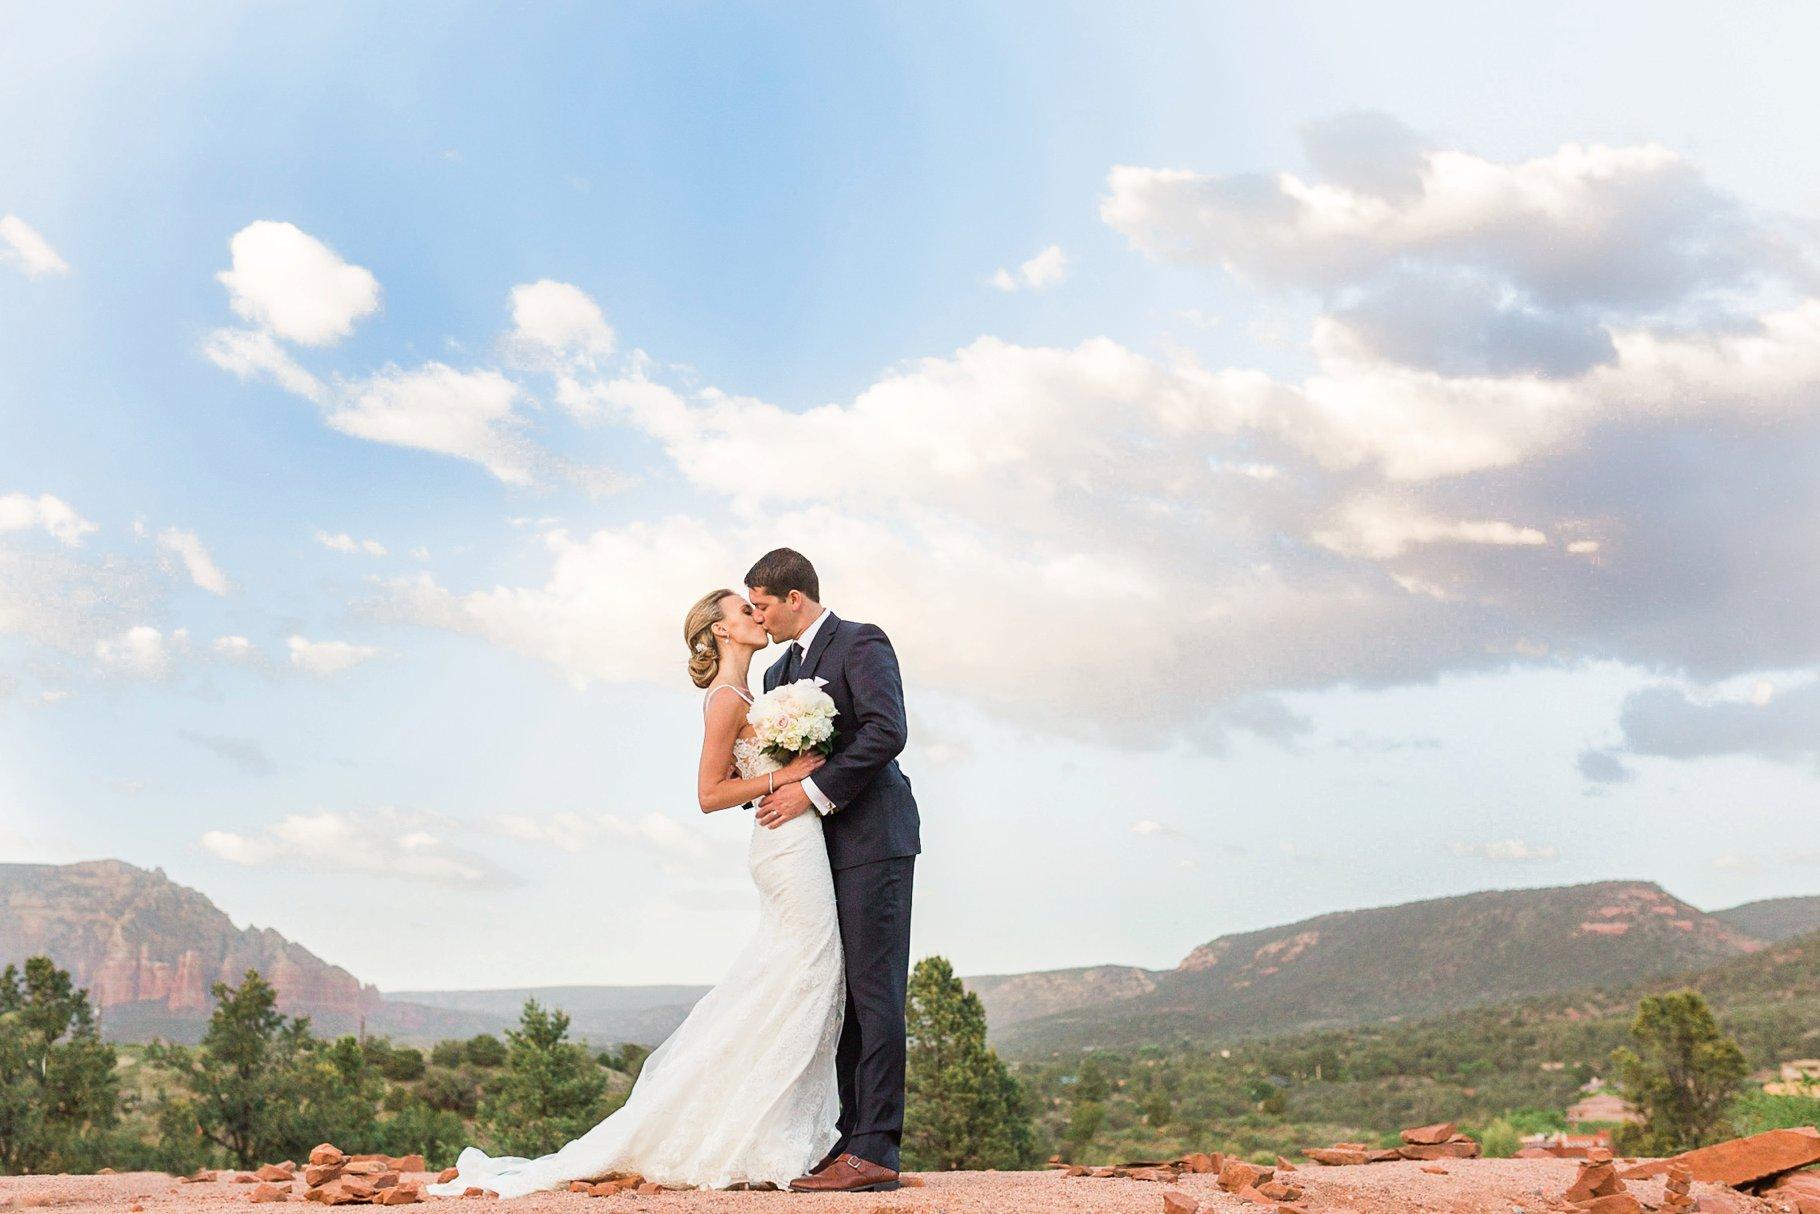 sedona wedding-116_GRETCHEN WAKEMAN PHOTOGRAPHY.jpg